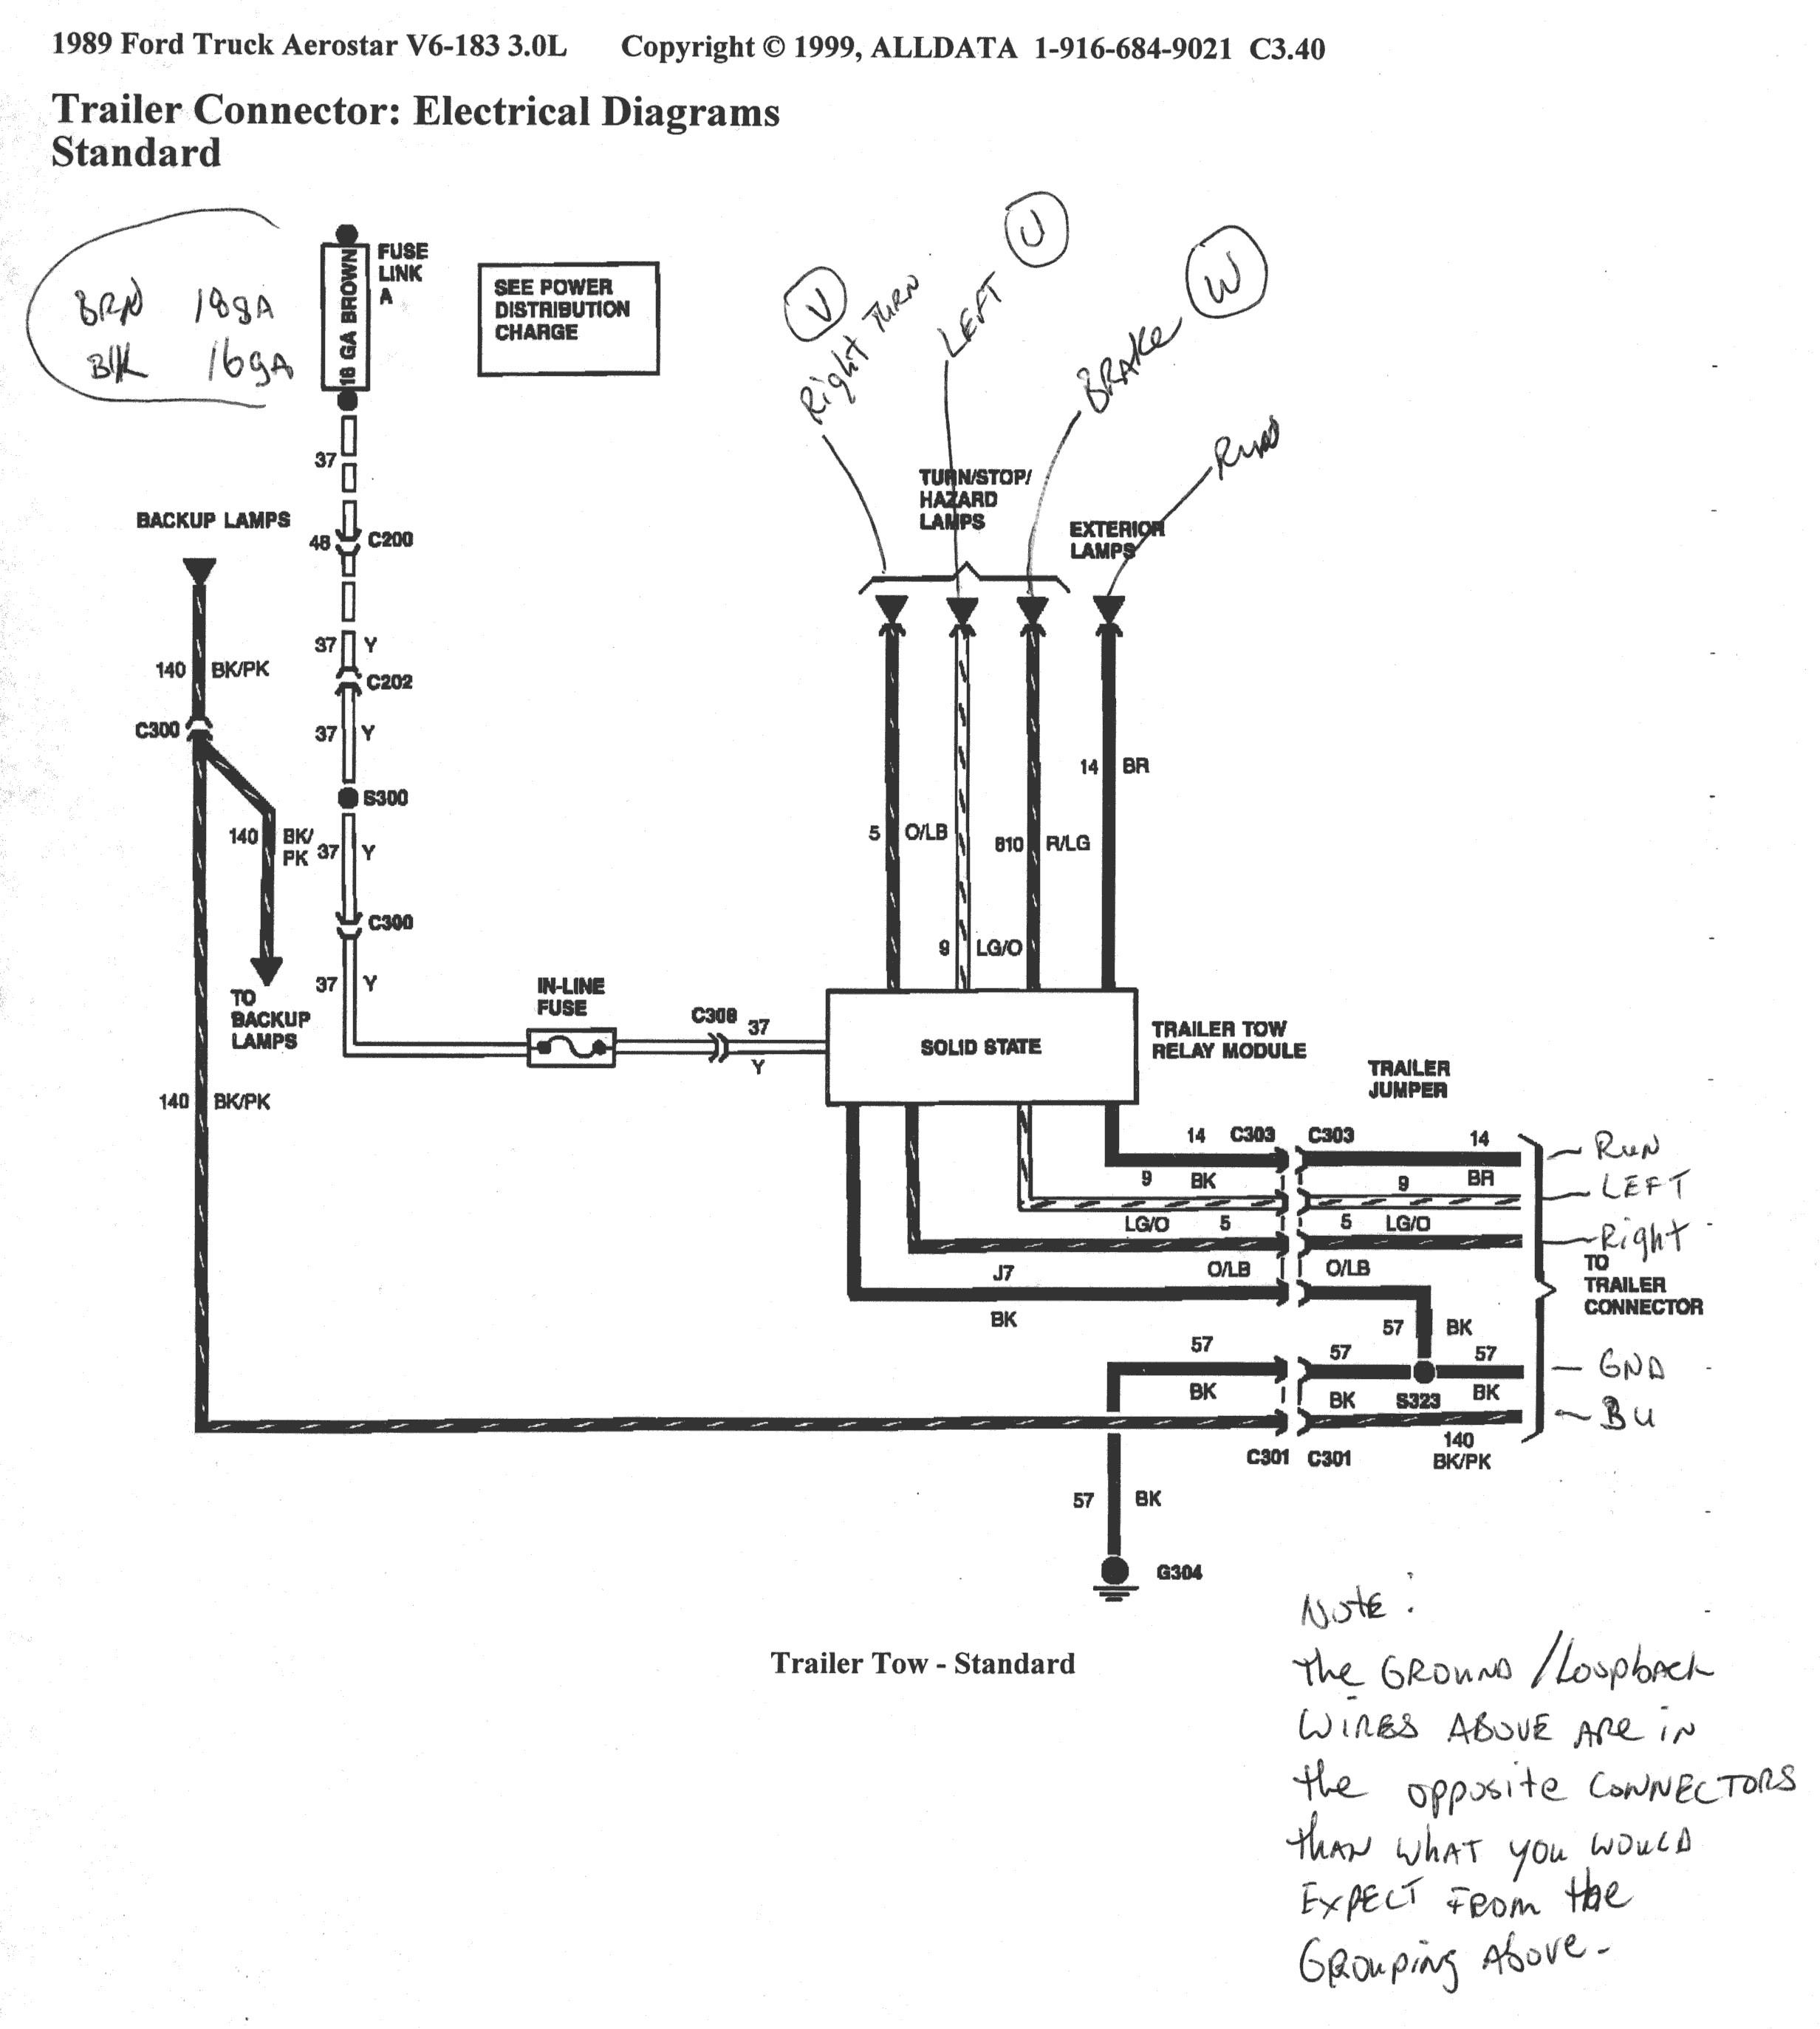 Wiring Diagram Car Trailer : Car trailer wiring diagram and schematics